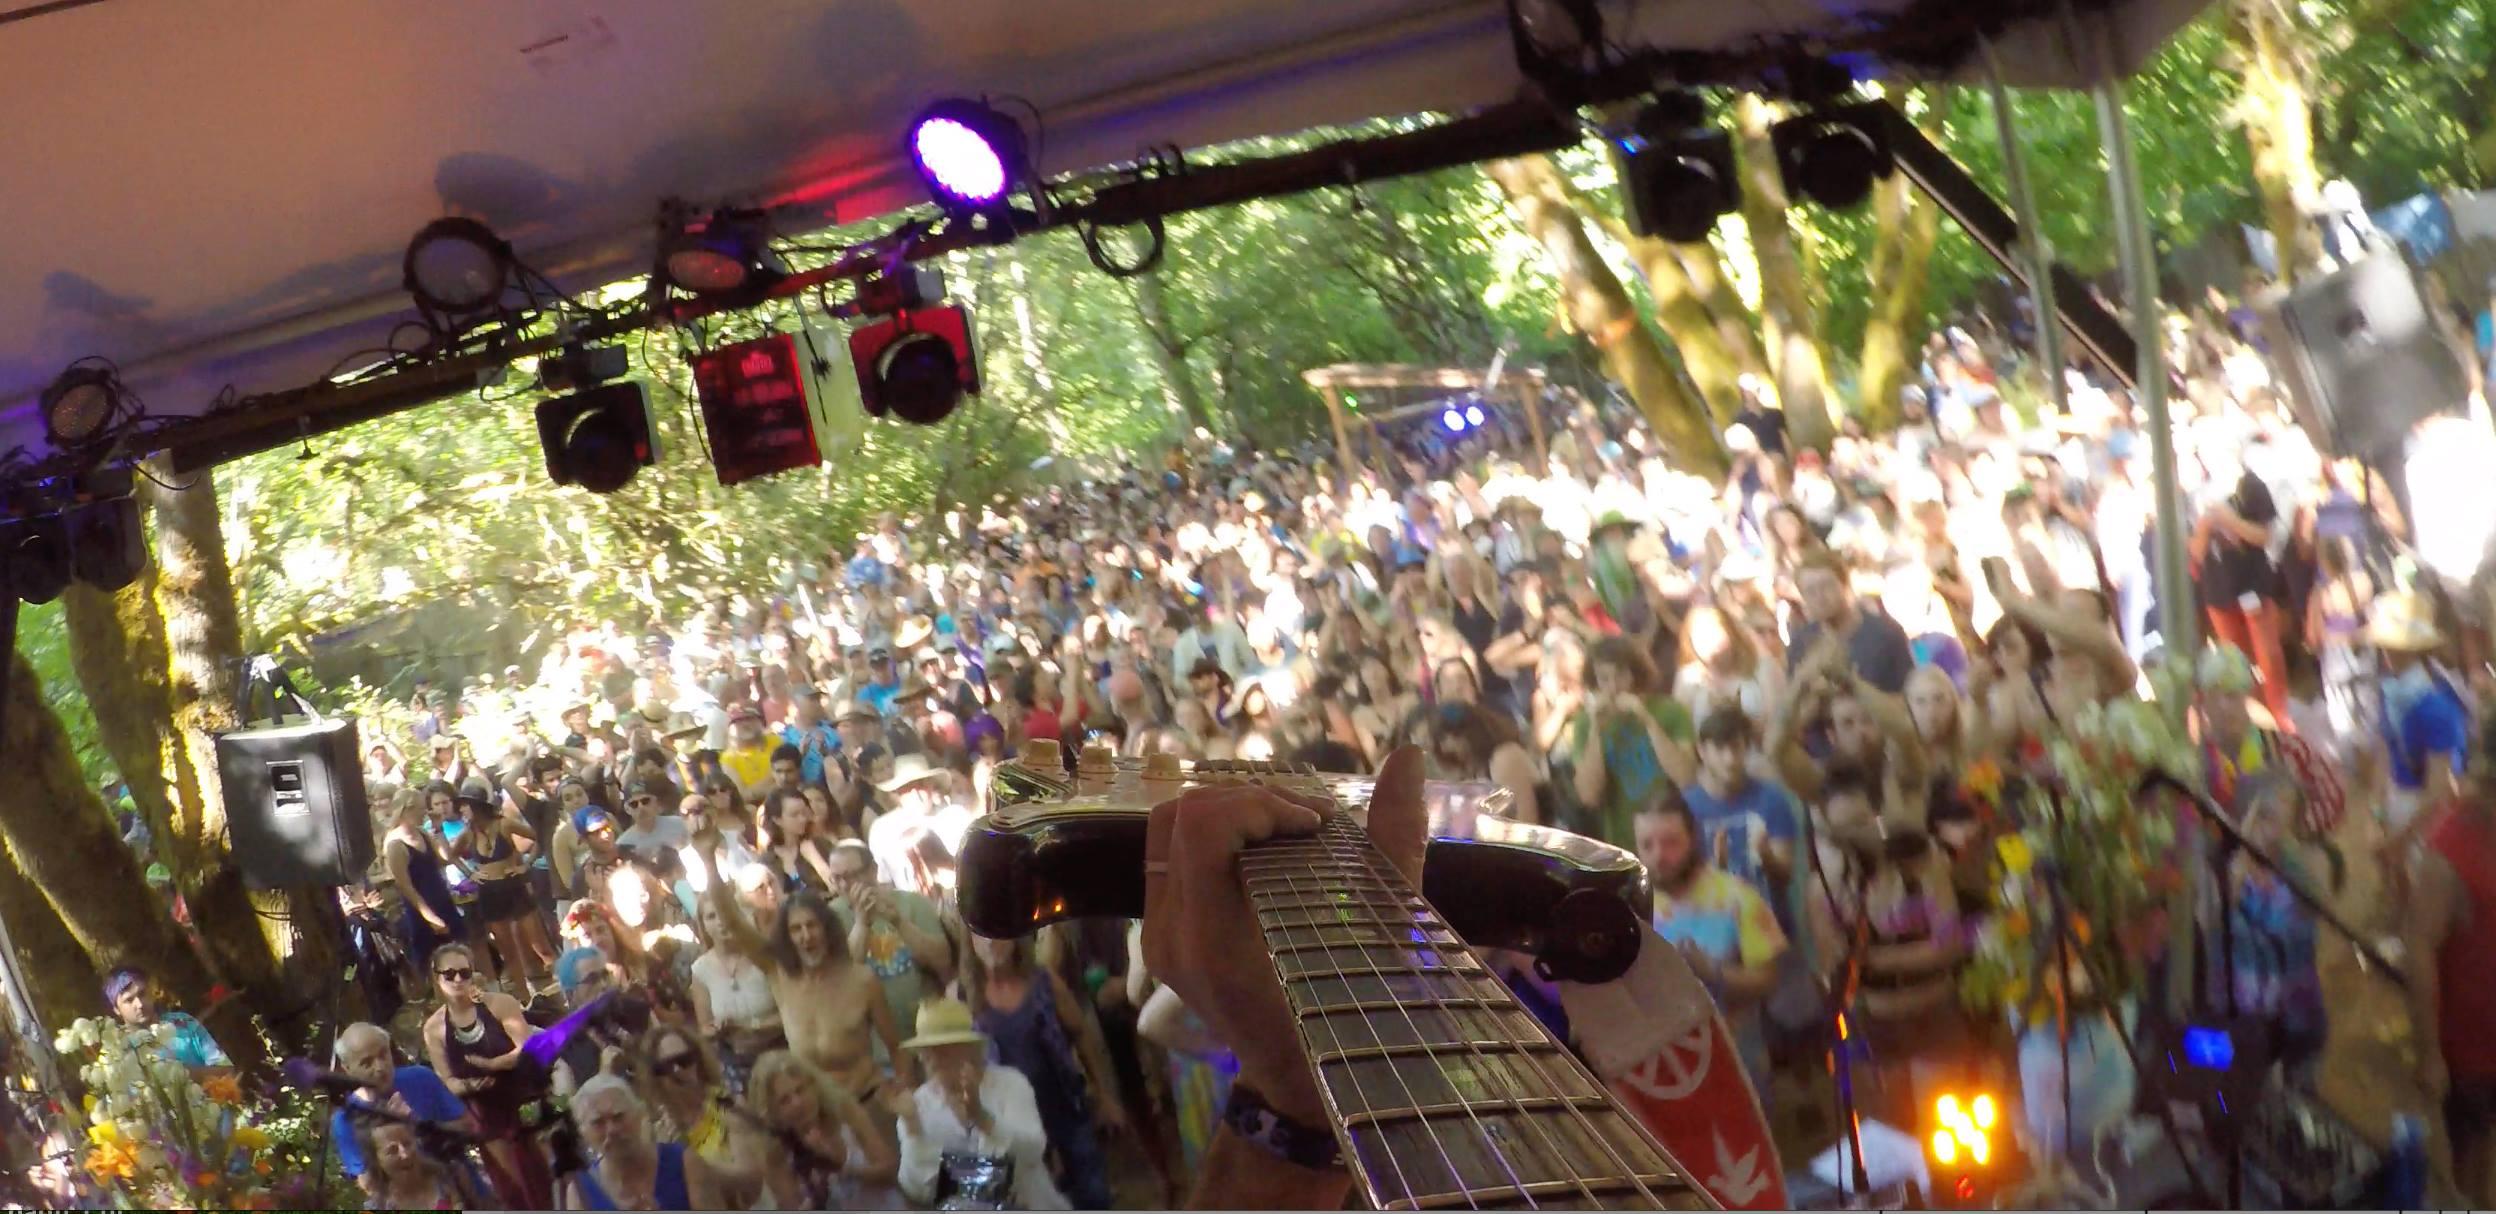 Jeff Pevar Guitar mania with ZEPDRIX, Oregon Country Fair